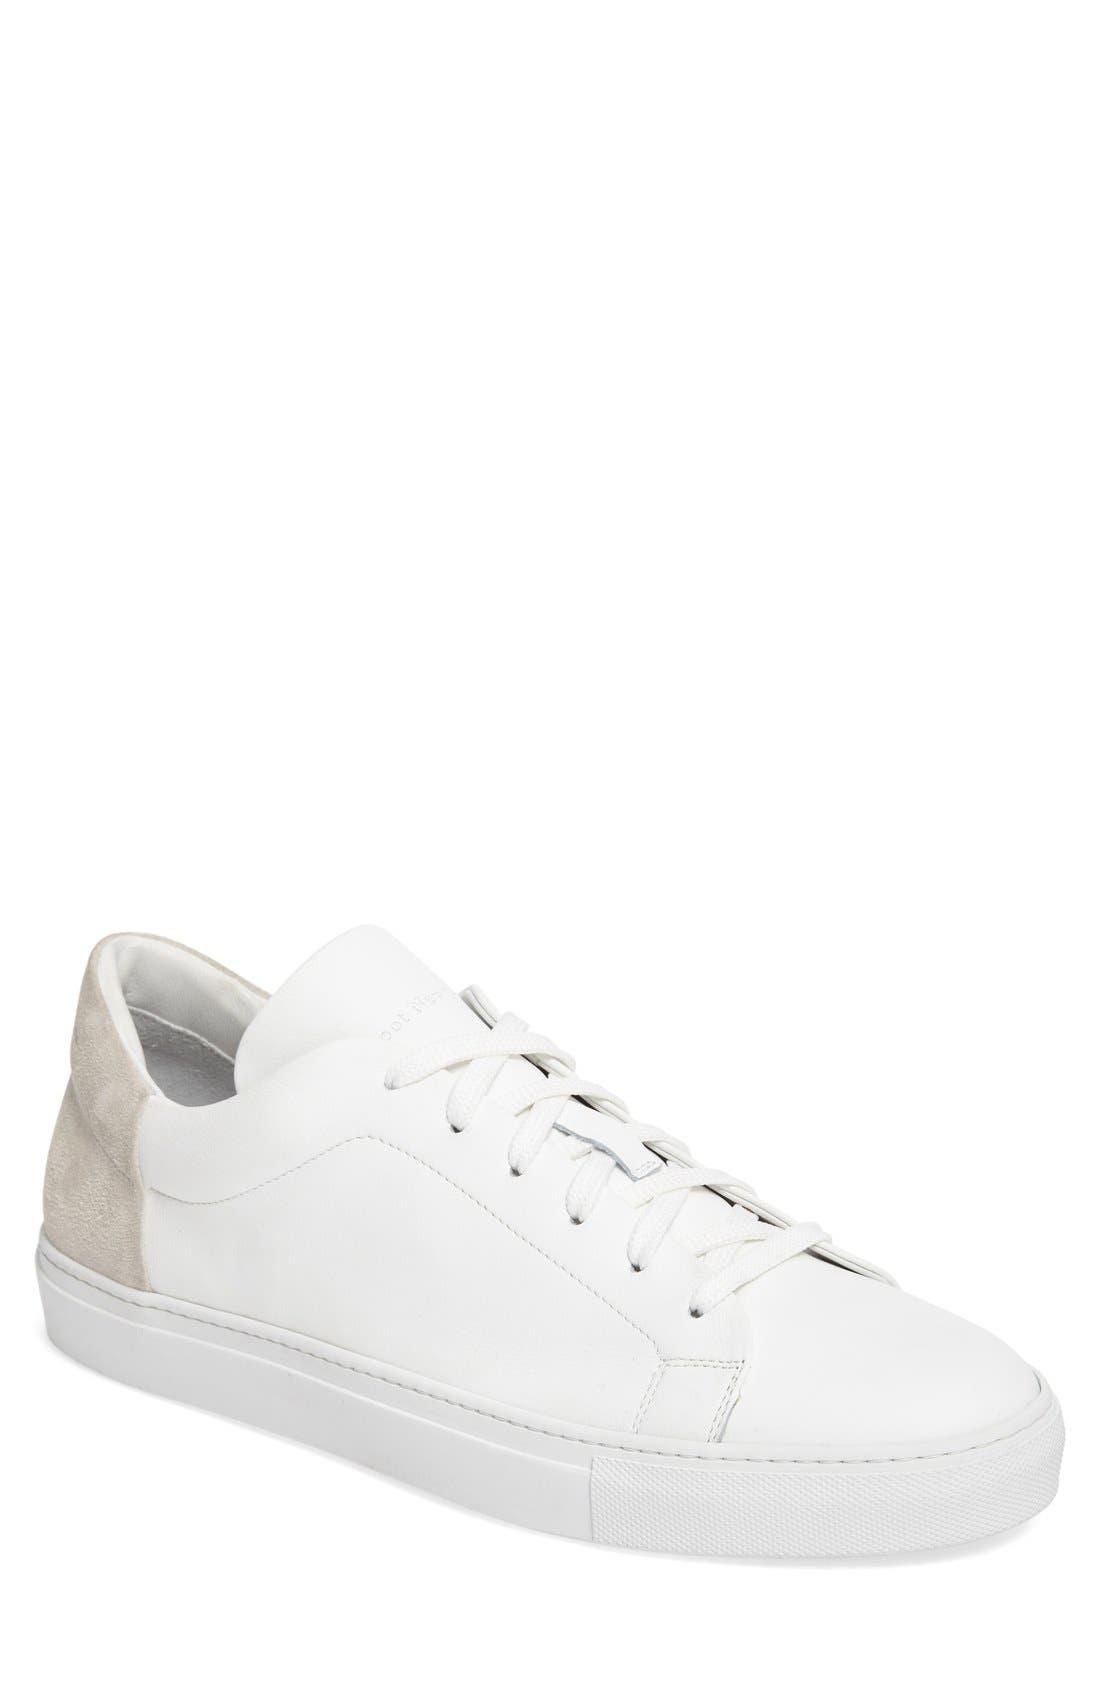 Main Image - To Boot New York Huston Sneaker (Men)